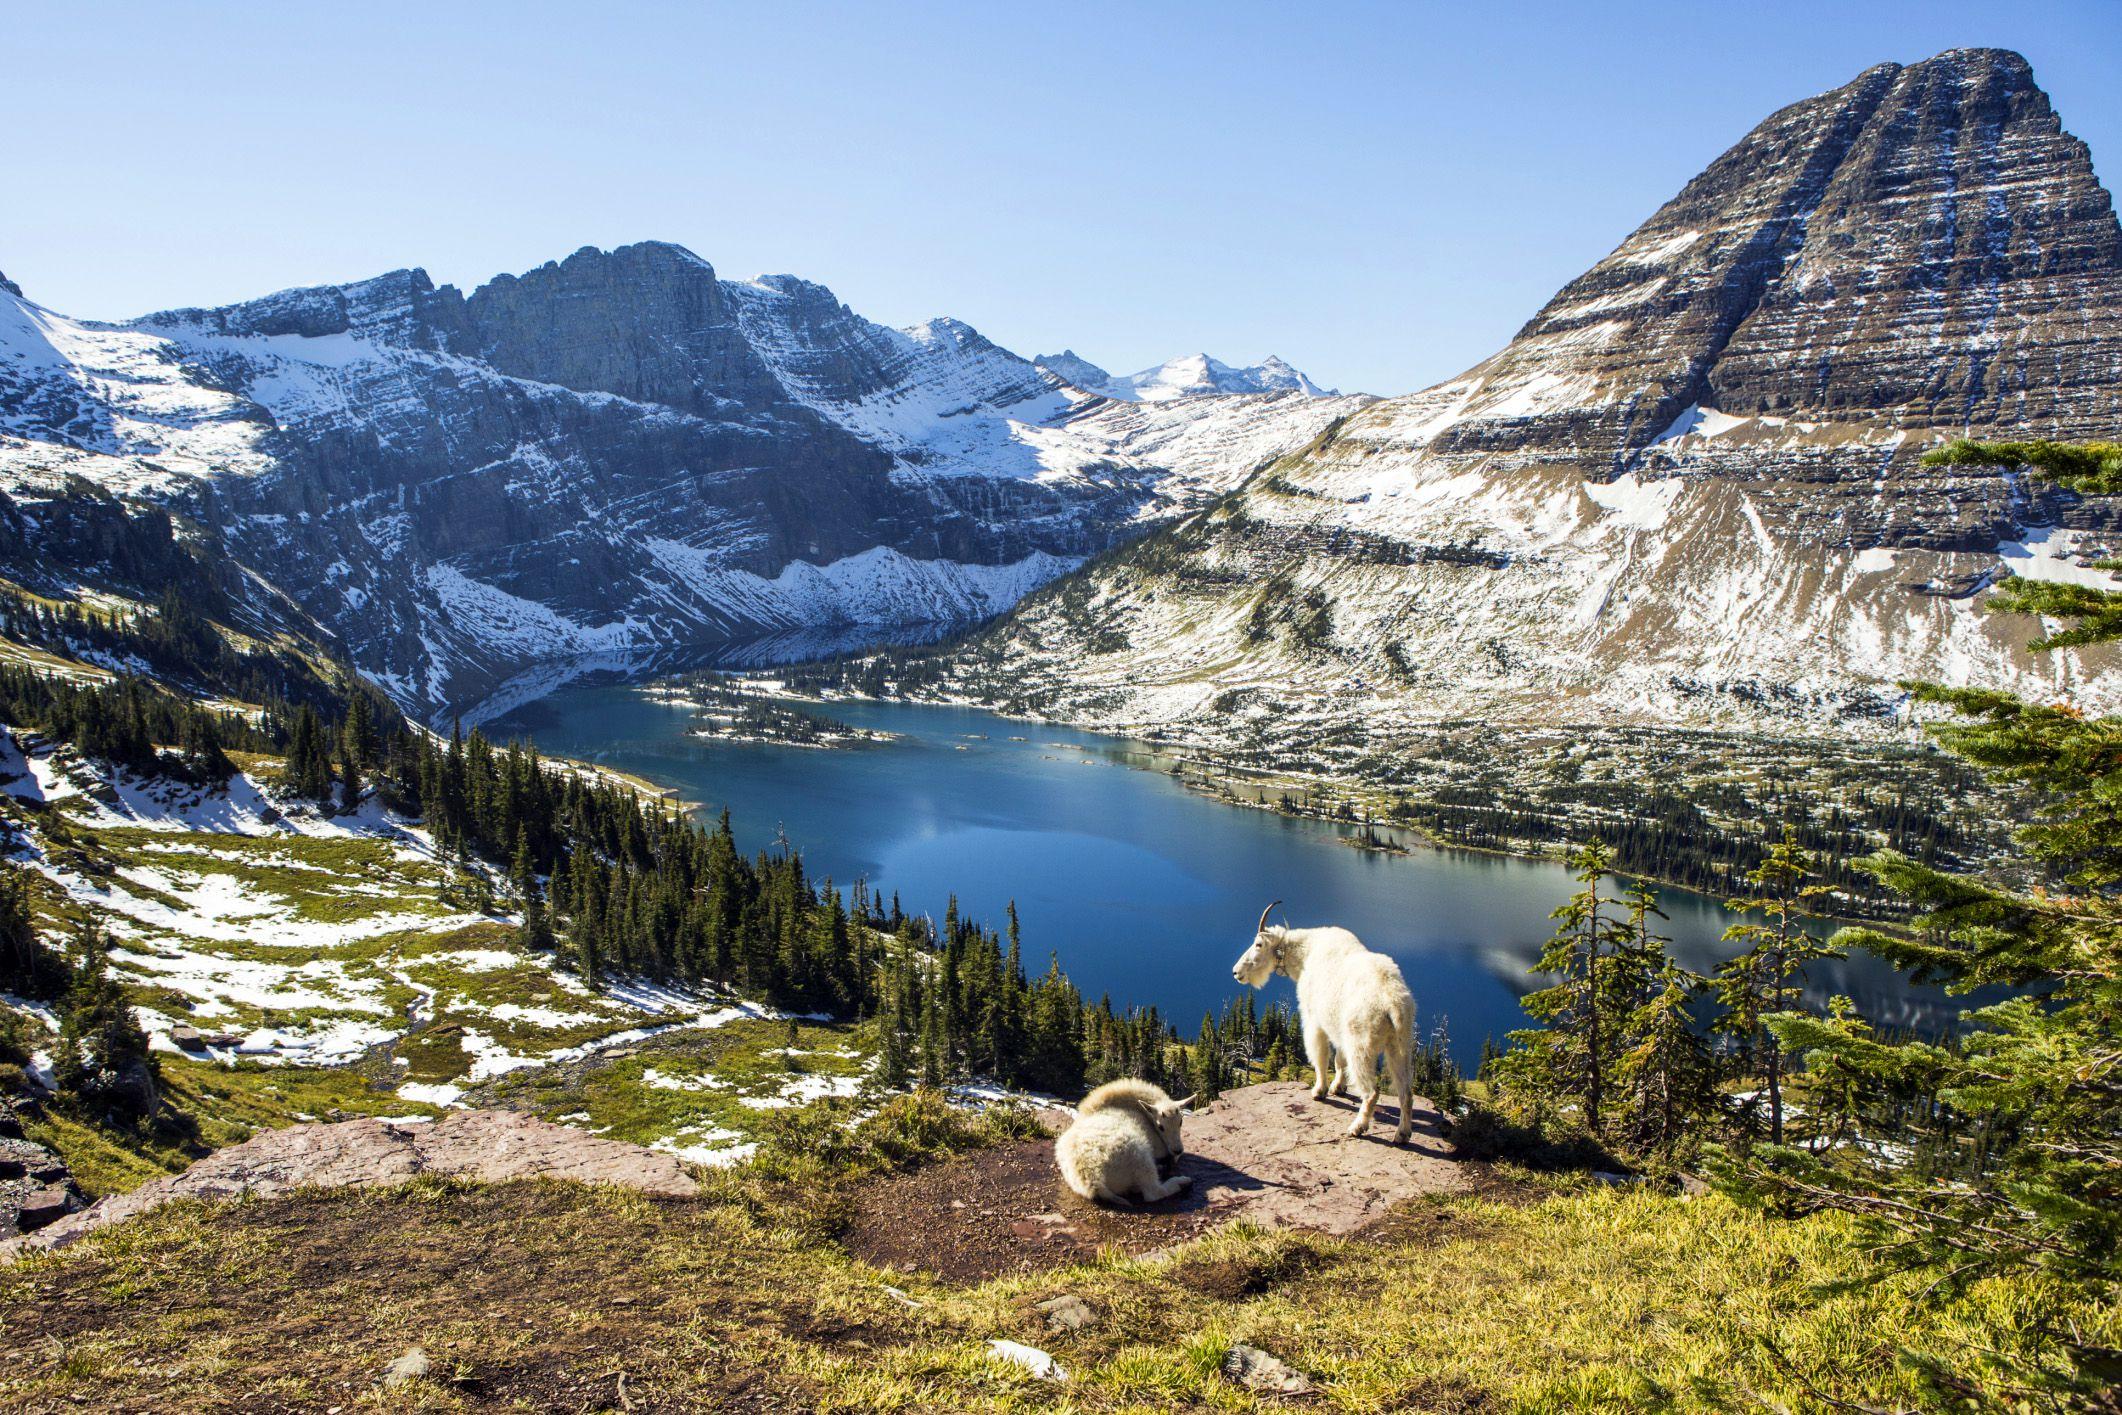 Scenery and Wildlife in Glacier National Park